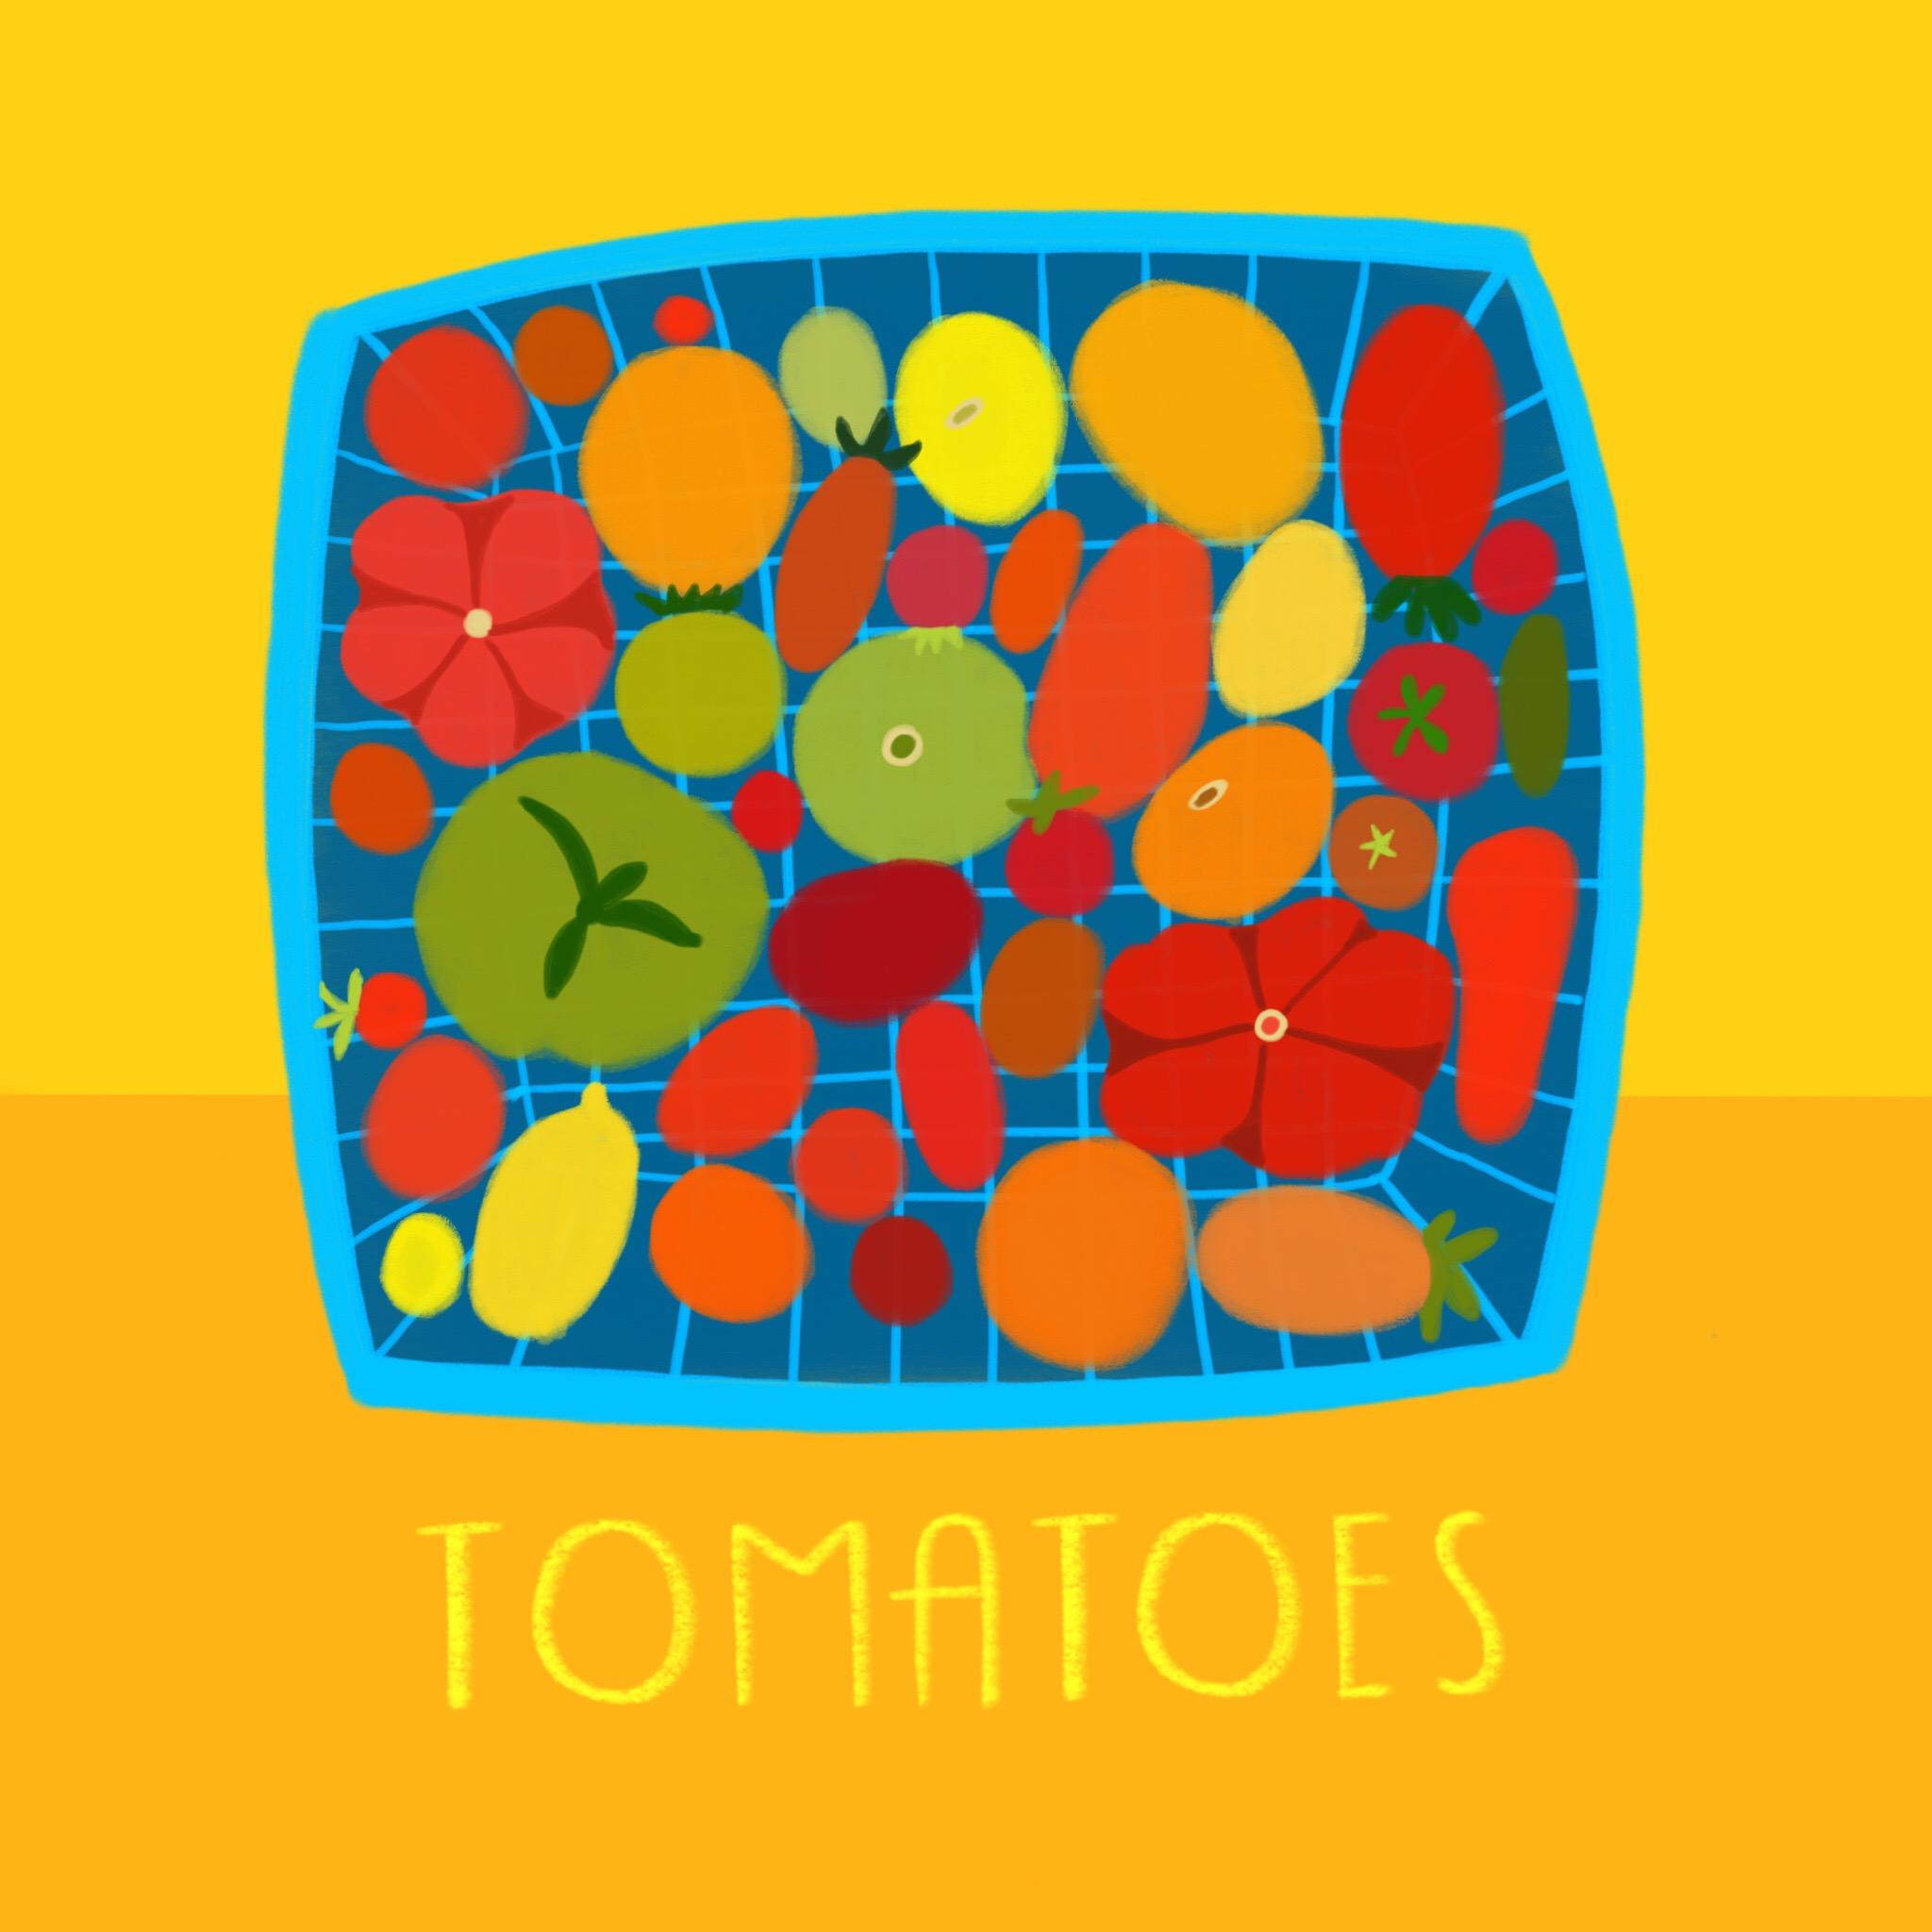 21_-_Tomatoes (1).jpg